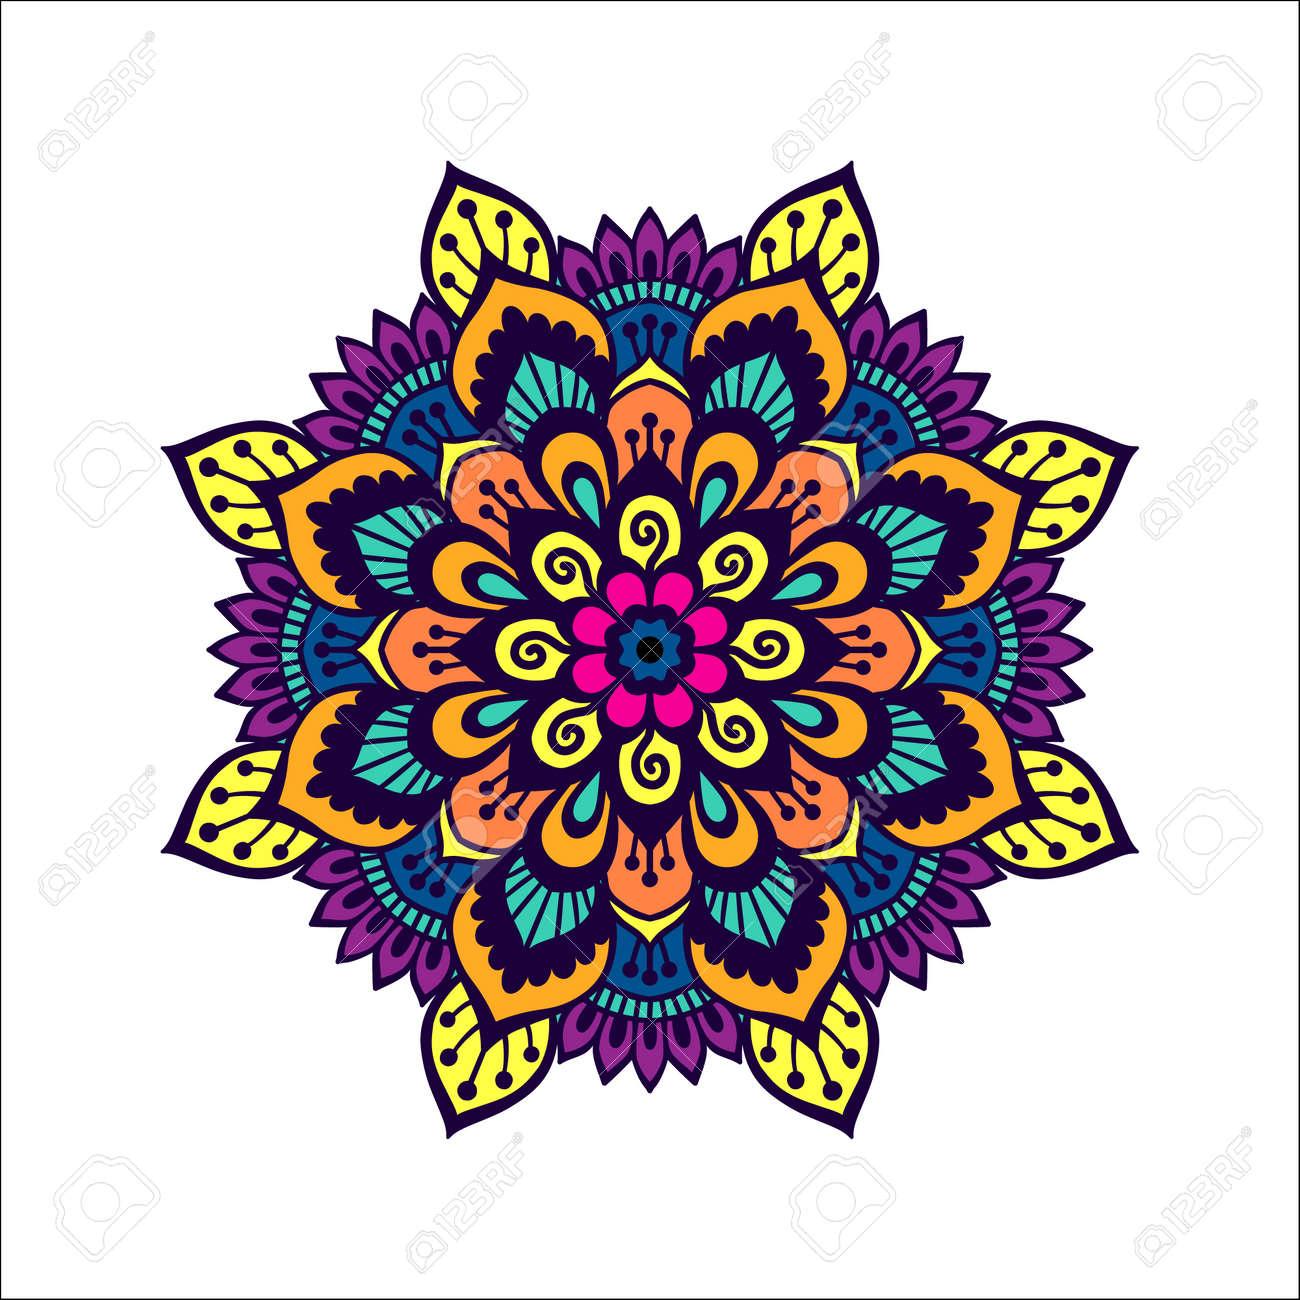 Colorful Mehendi Style Mandala Henna Tattoo Design Template